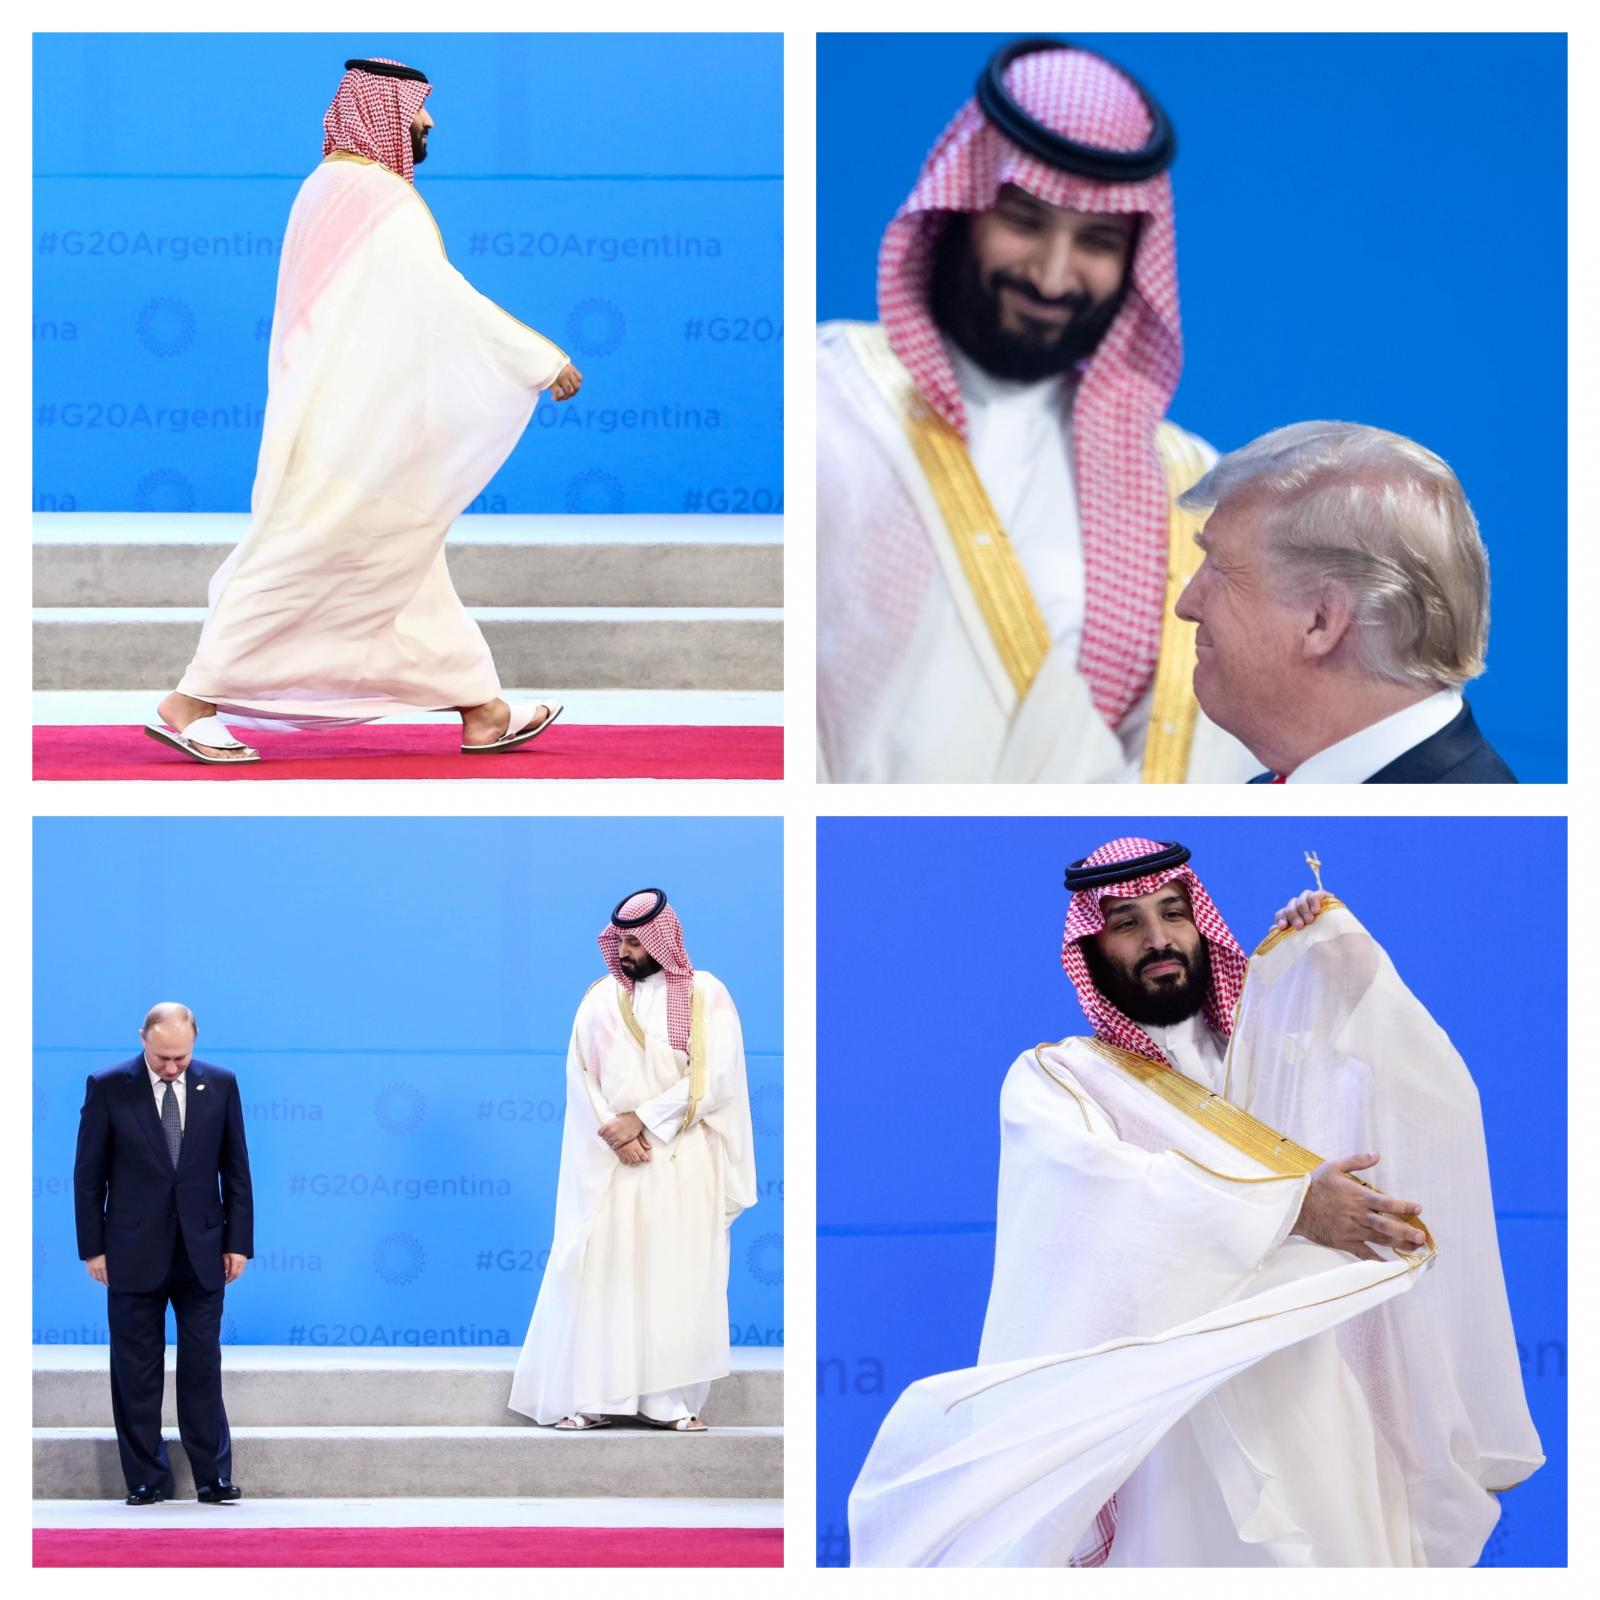 Savdski princ na vhu G20 v Argentini Vir: Pixsell 